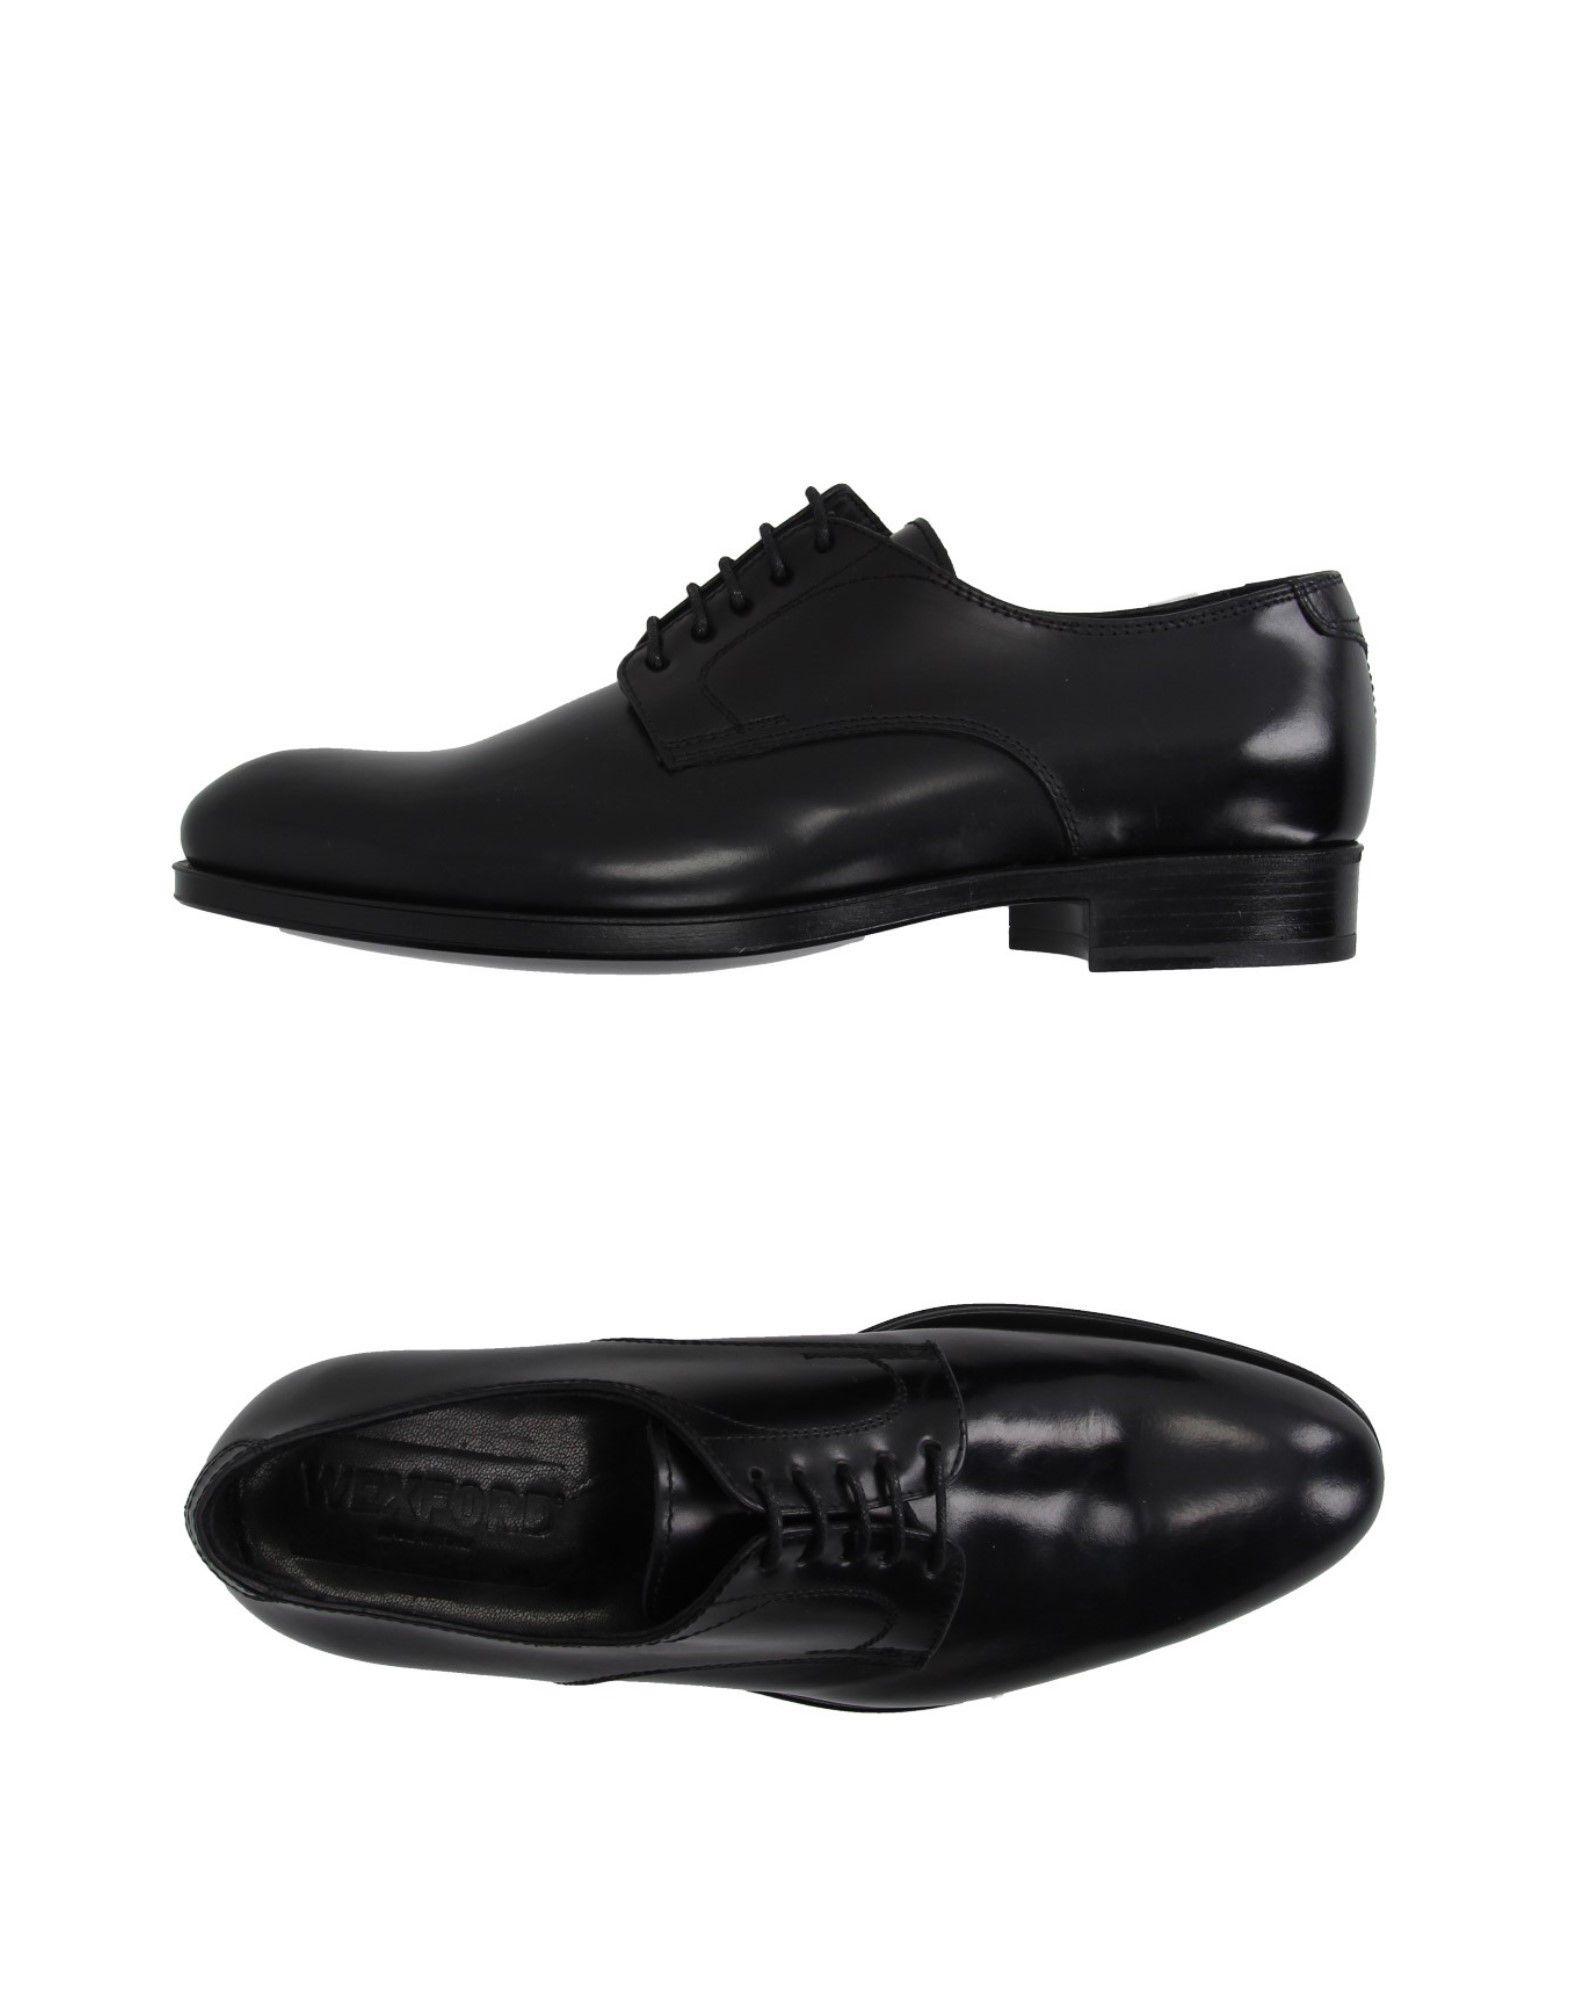 Rabatt  echte Schuhe Wexford Schnürschuhe Herren  Rabatt 11015747RN 4c67db